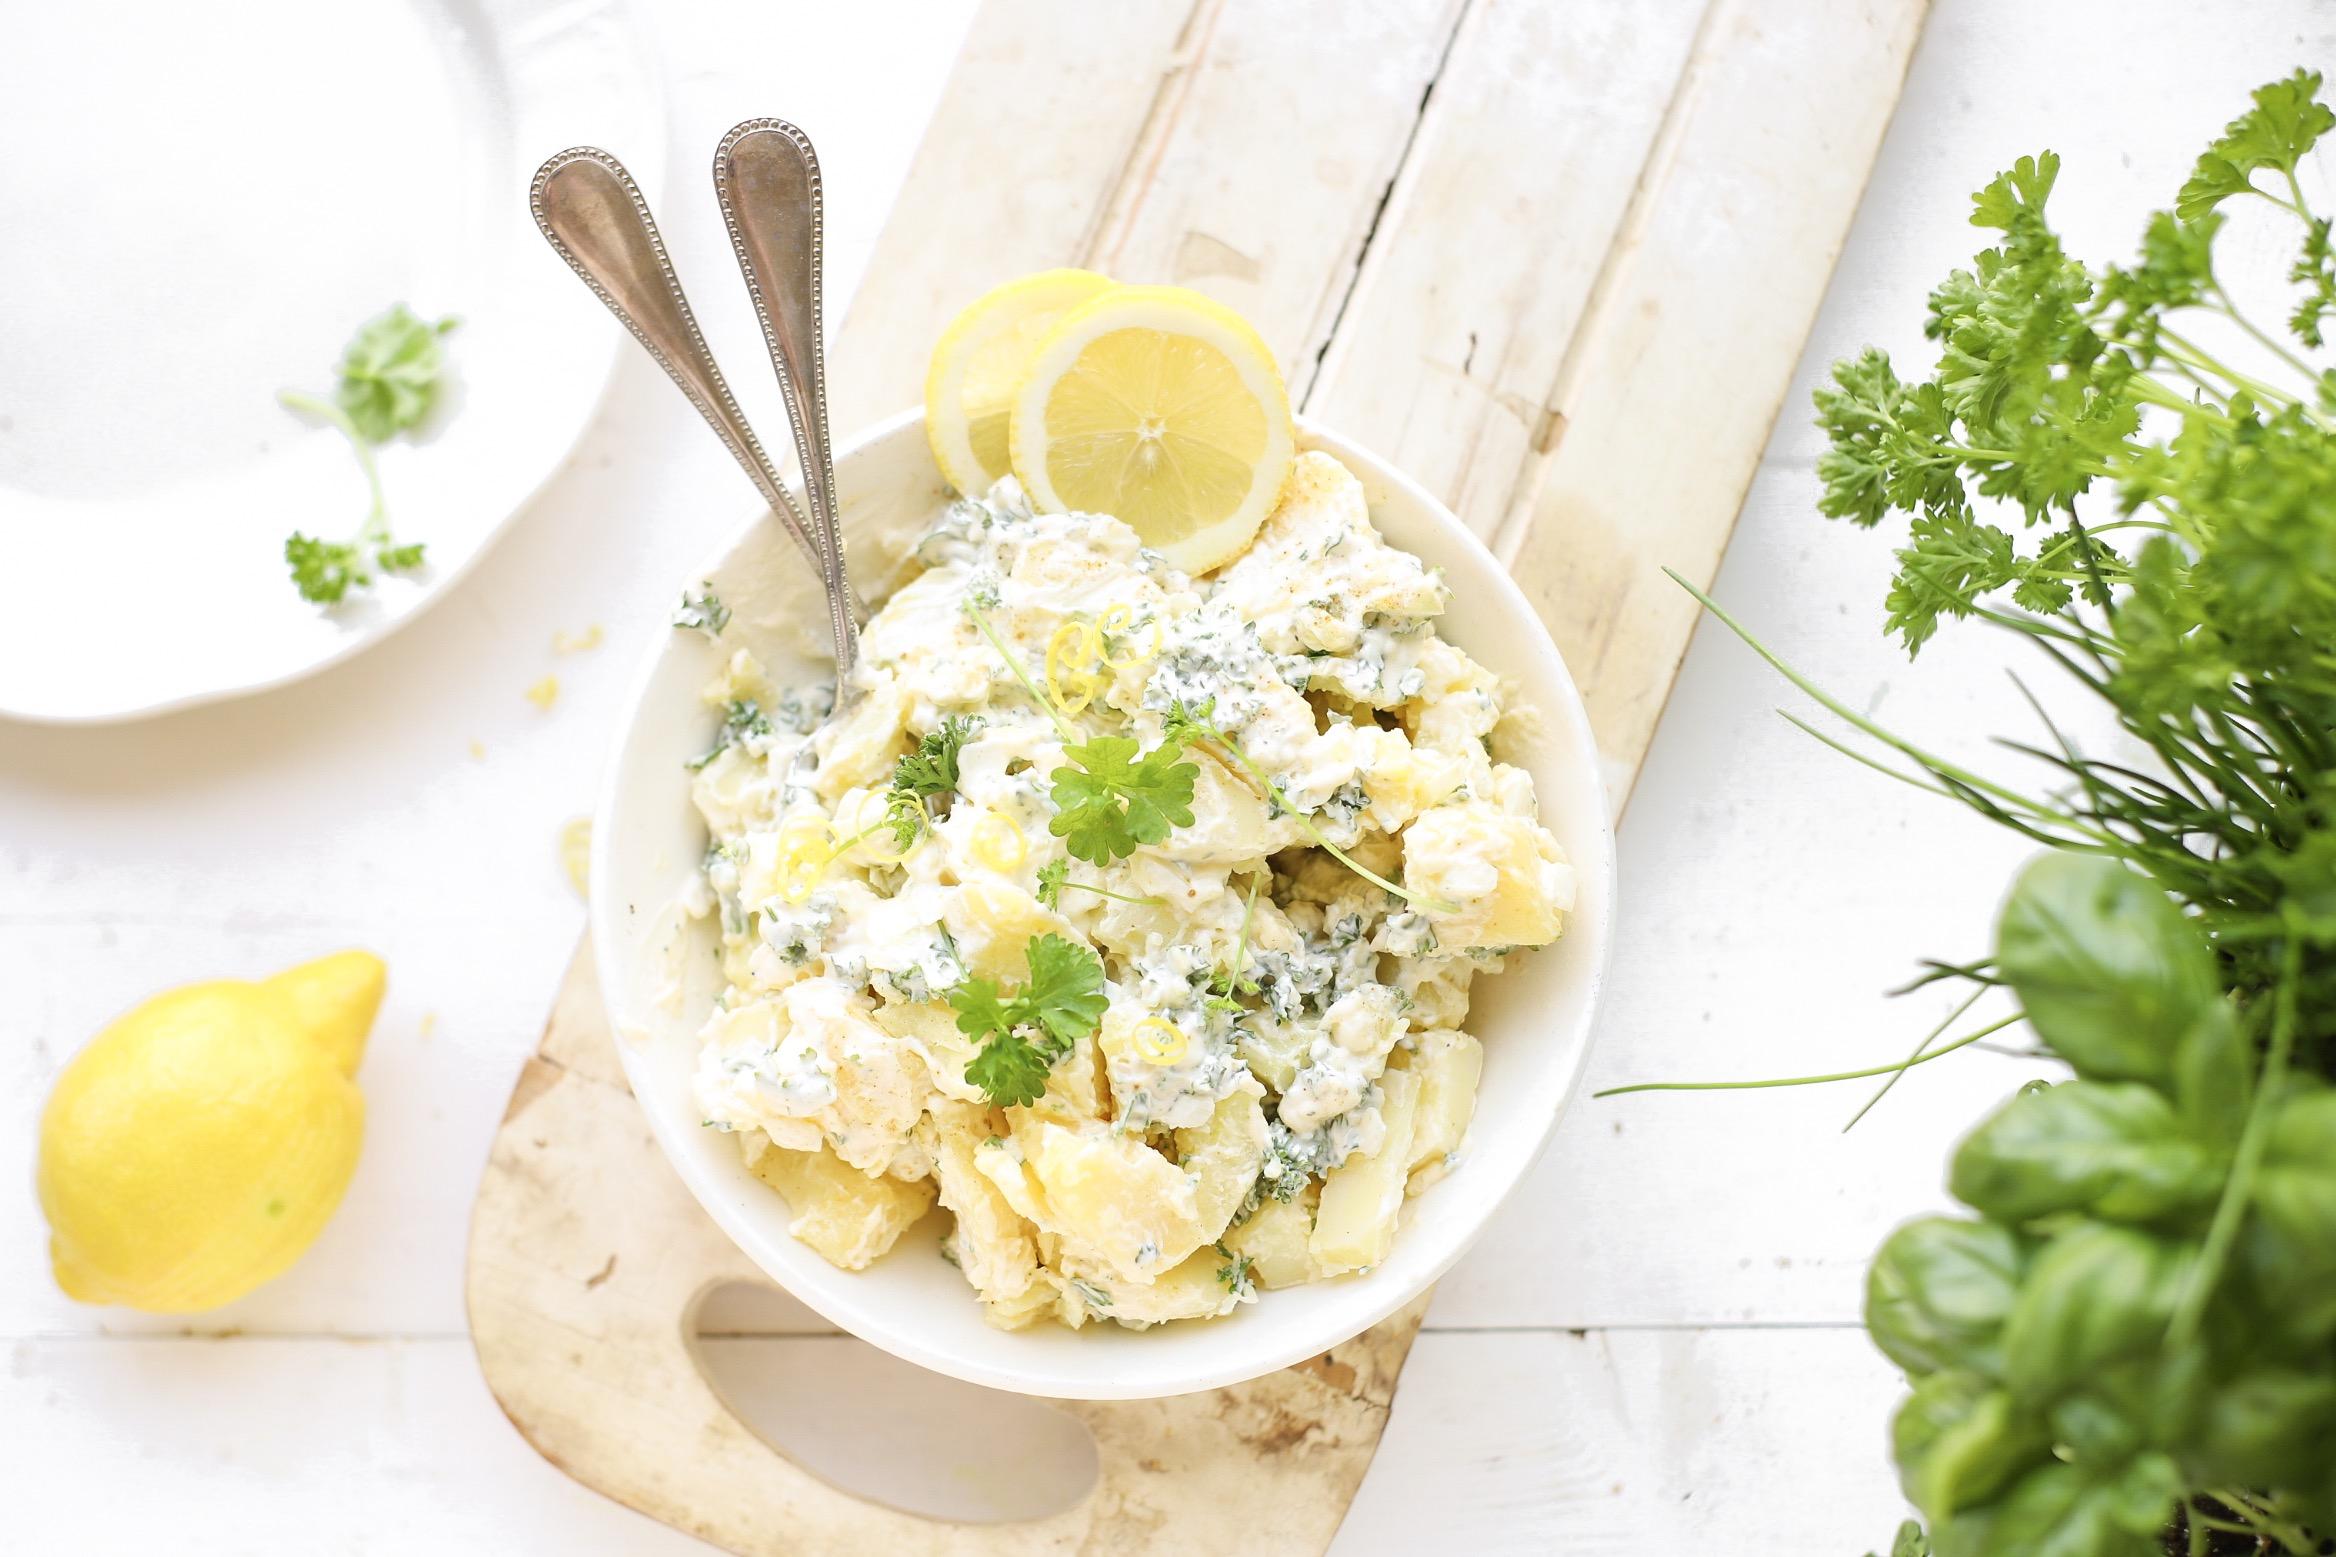 Aardappelsalade met groene kruiden & citroen 'The Lemon Kitchen